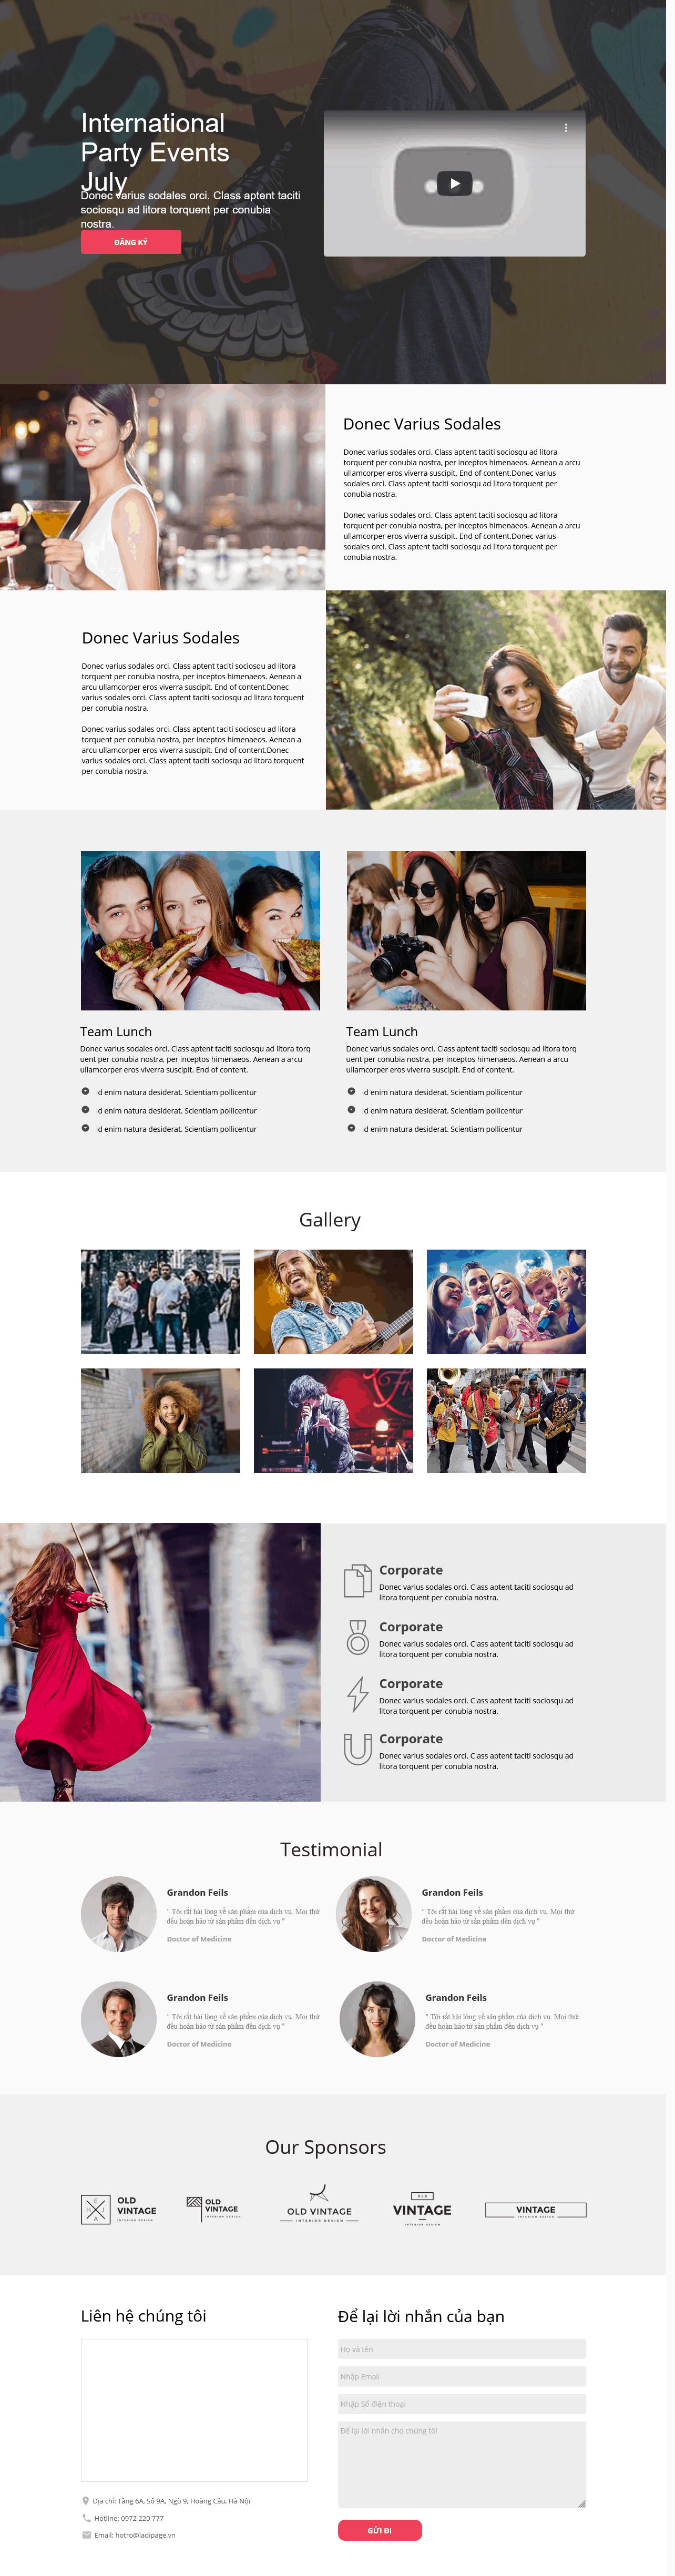 Thiết kế website Thiết kế webiste landingpage dien-anh---truyen-hinh Giải trí 07